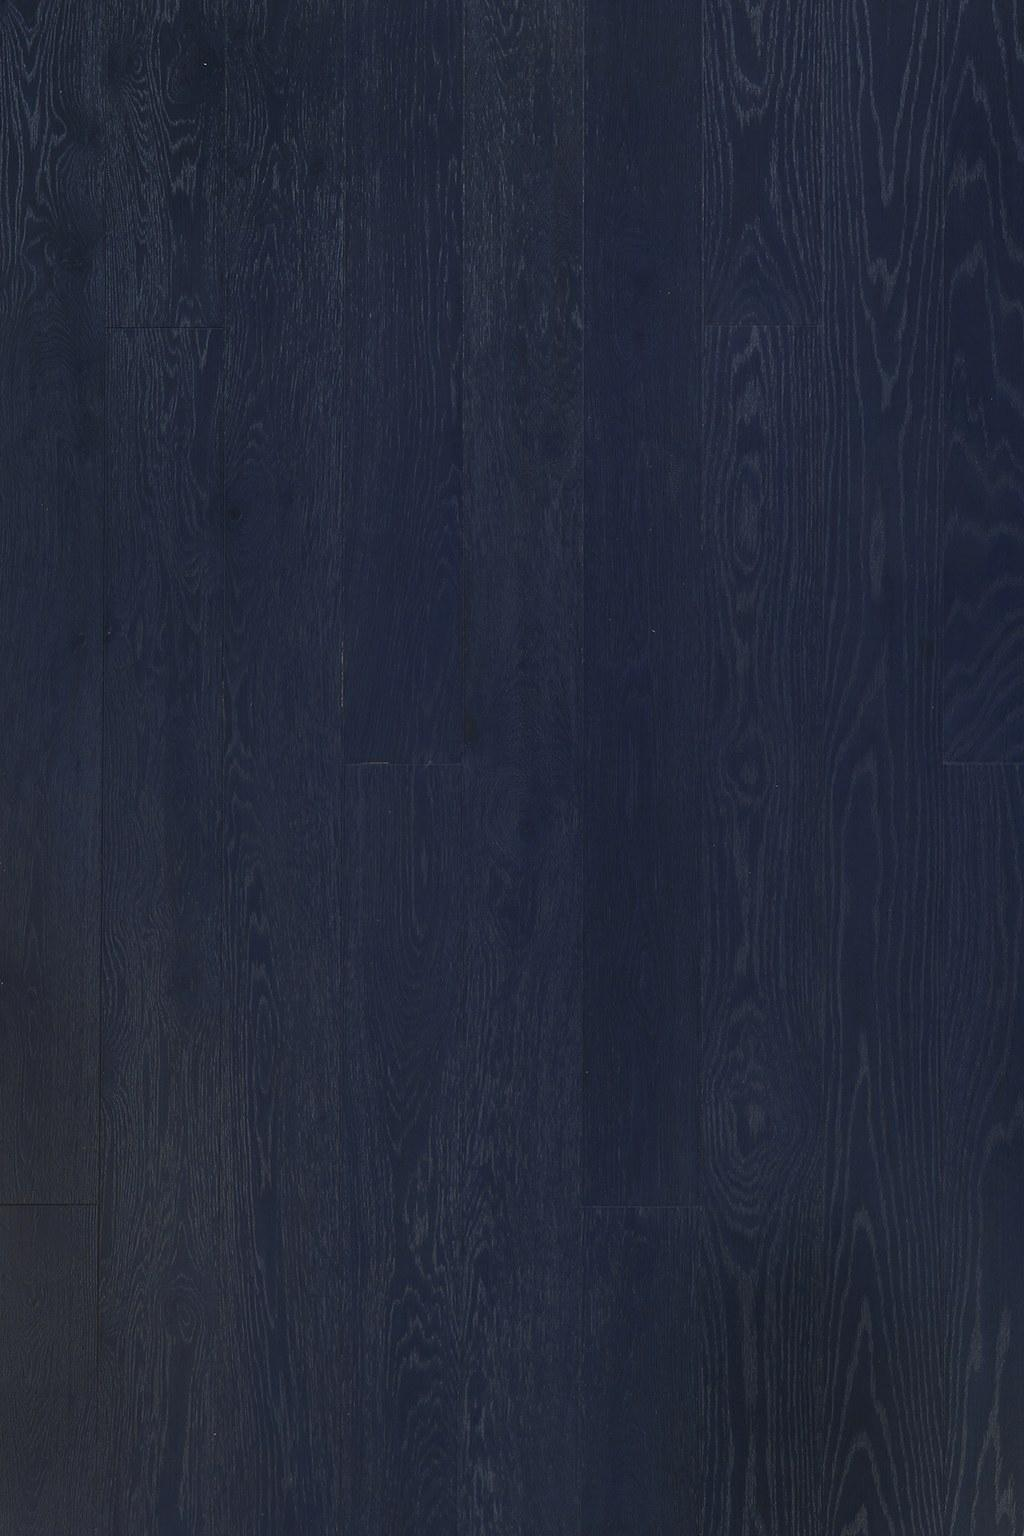 Timberwise parketti lankkuparketti puulattia wooden floor parquet plank Tammi Oak Blueberry_2D1